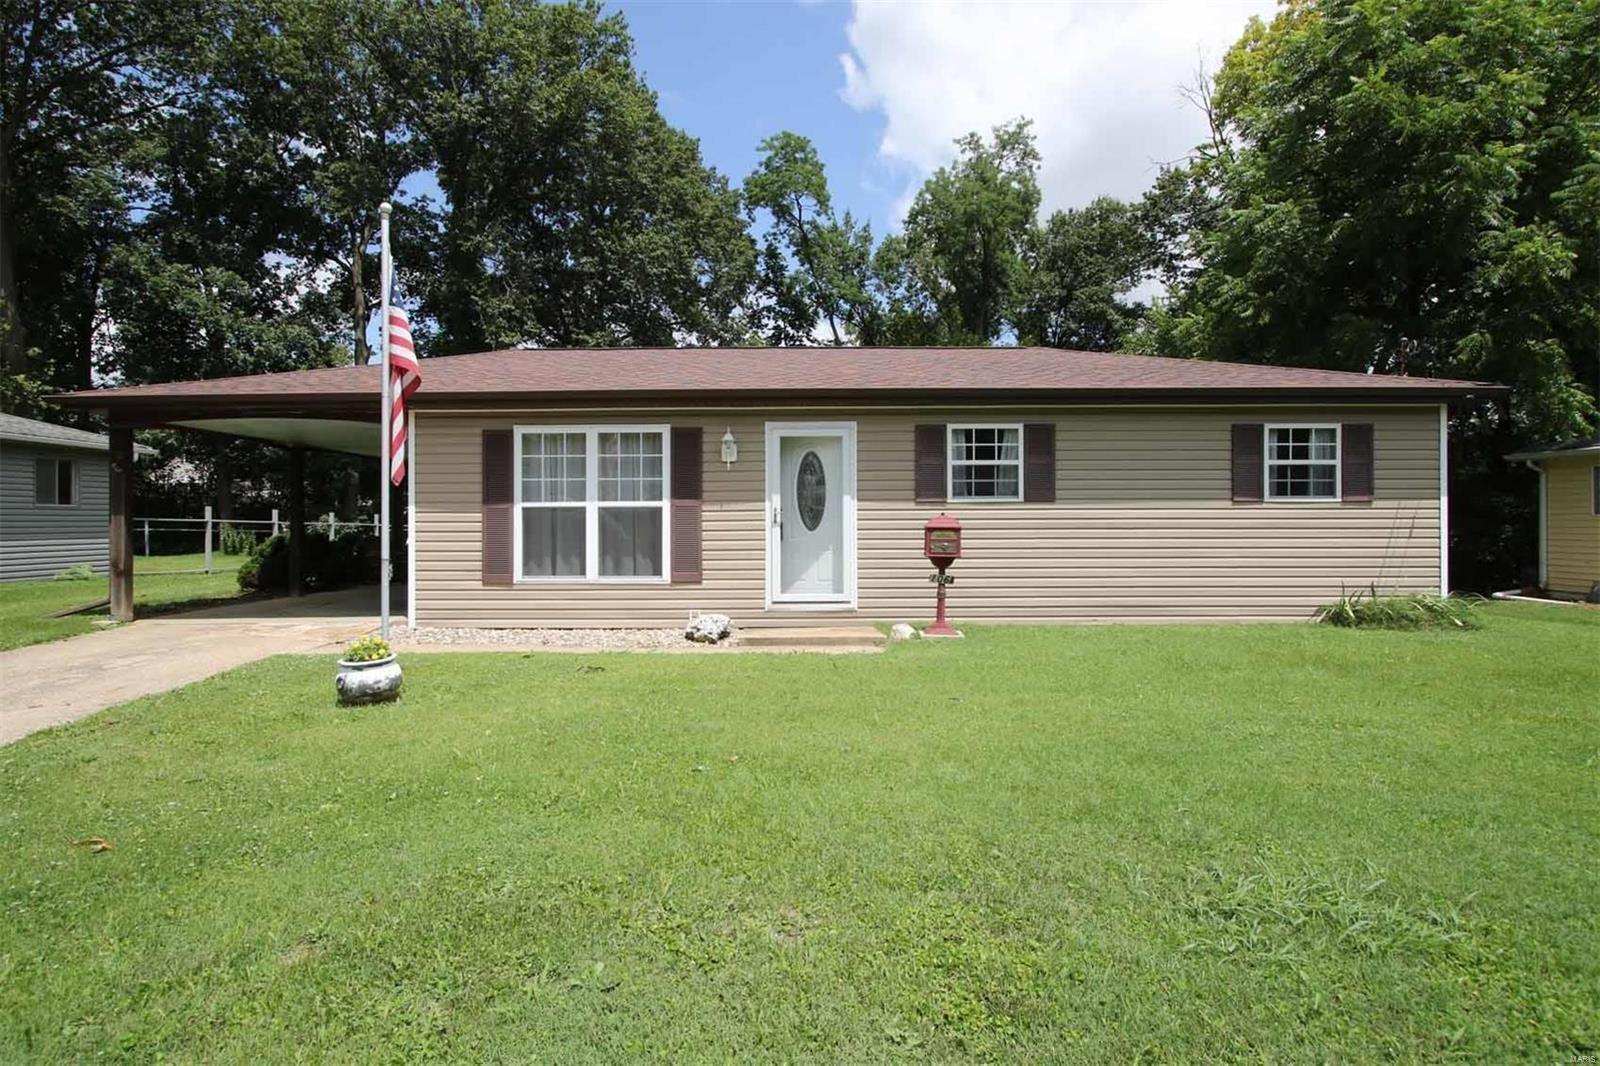 106 Village Drive, Collinsville, IL 62234 - MLS#: 21048865